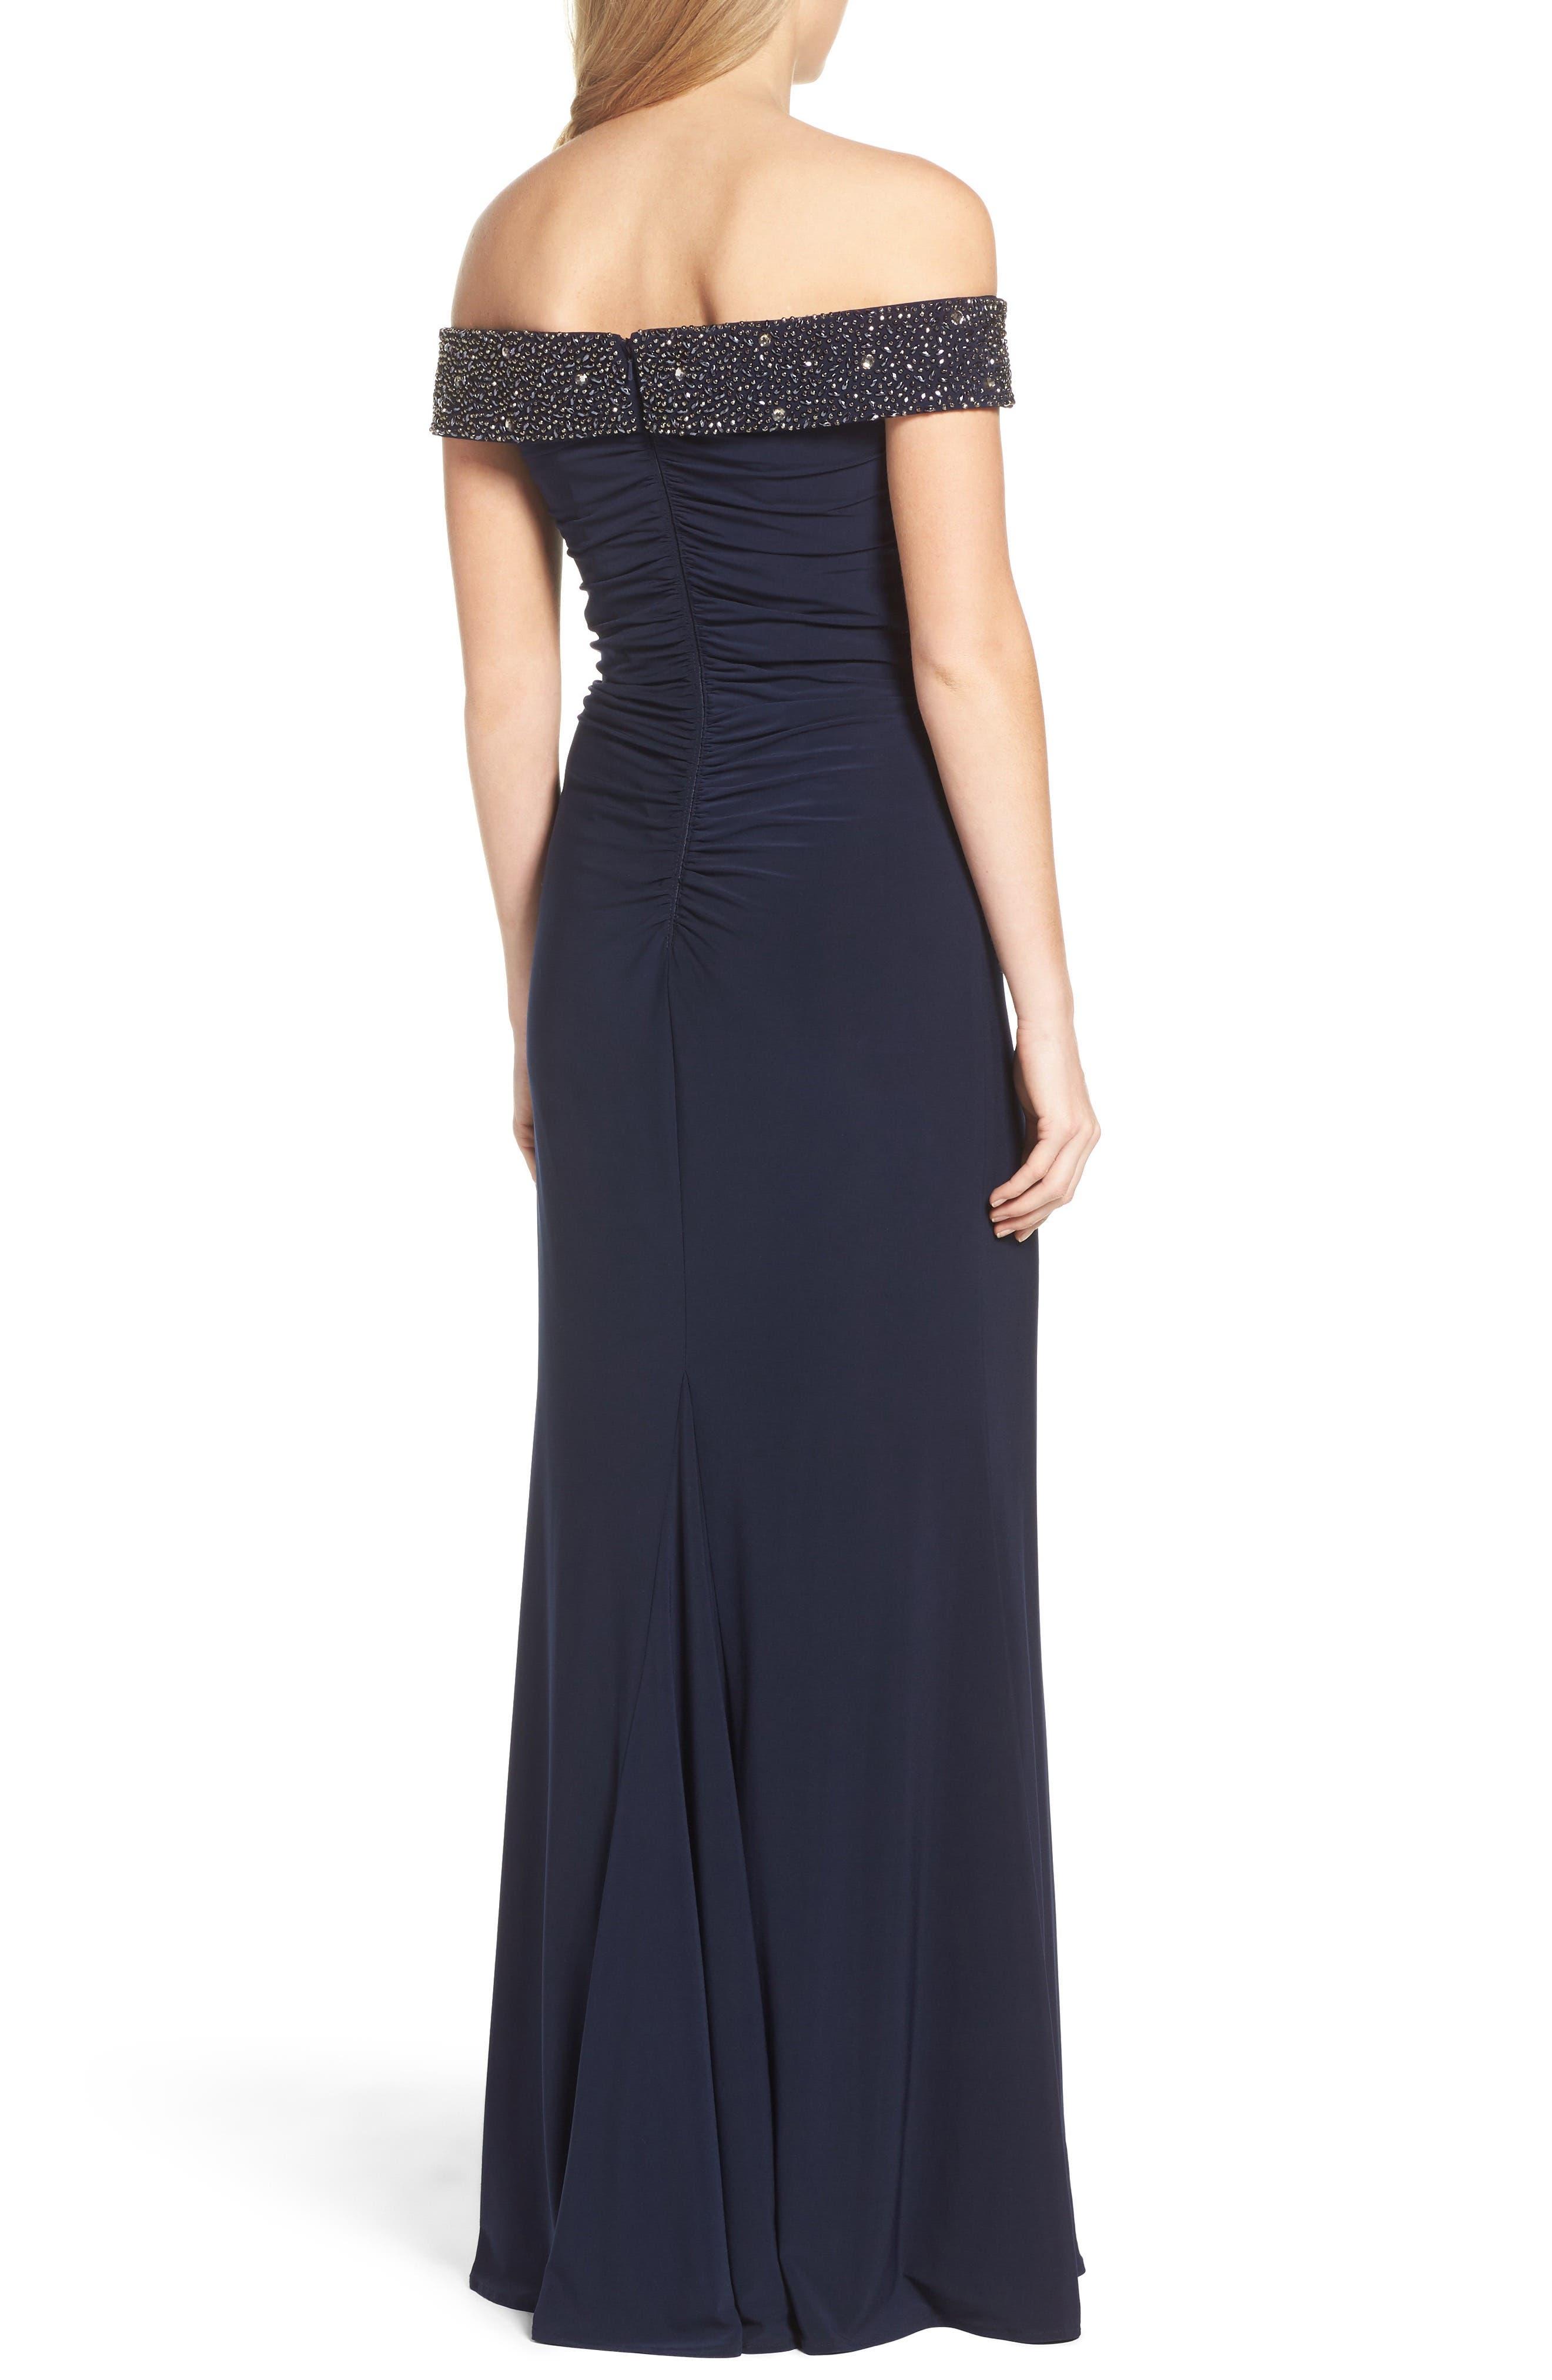 Alternate Image 2  - Xscape Off the Shoulder Beaded Gown (Regular & Petite)